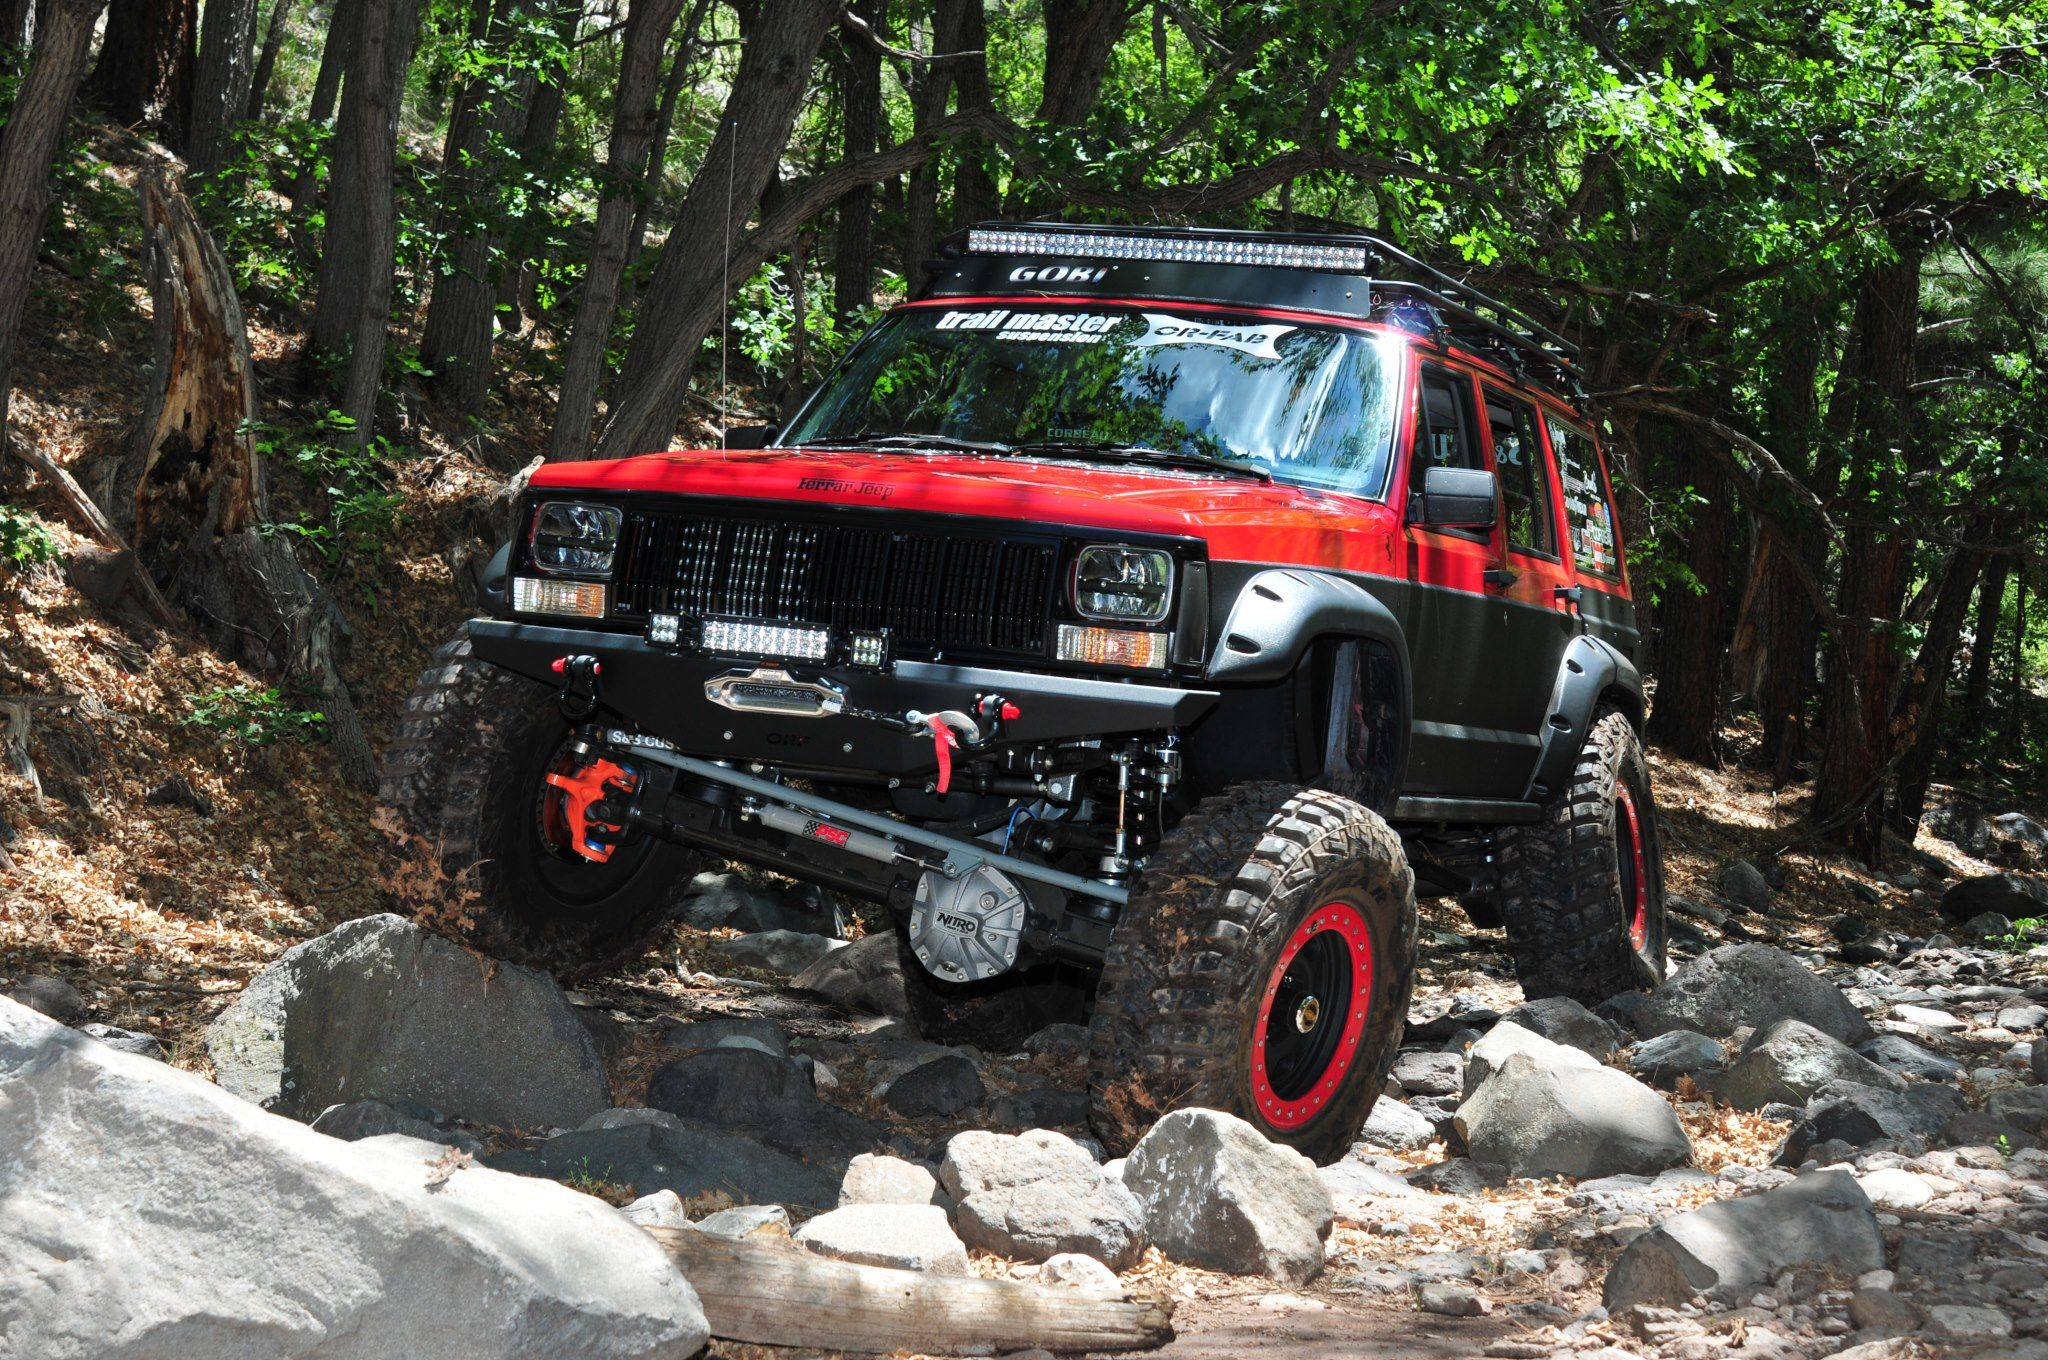 Jeep Xj On The Rocks Jeep Cherokee Xj Jeep Cherokee Jeep Xj